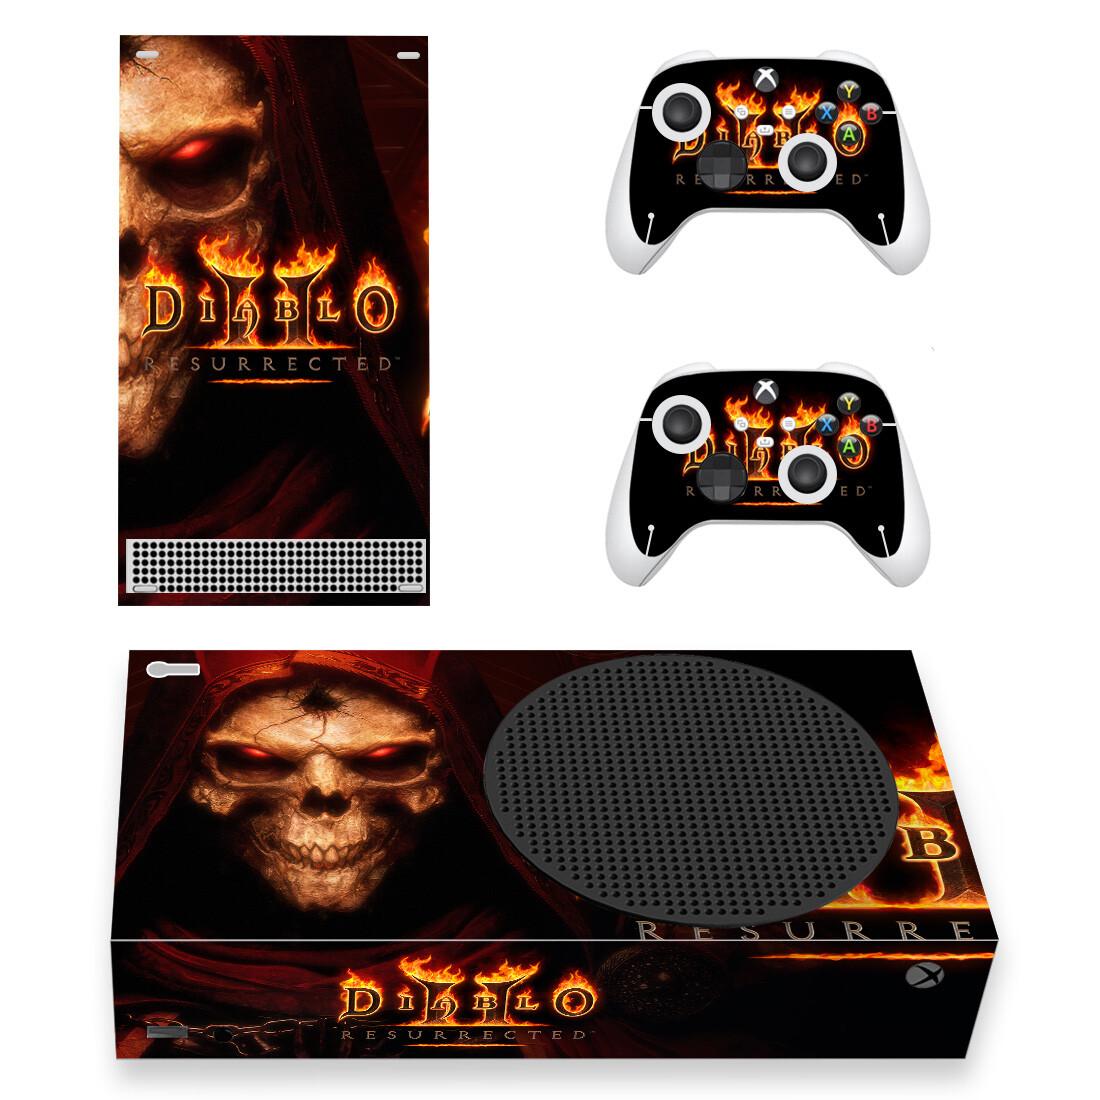 Diablo 2 Skin Sticker Decal For Xbox Series S